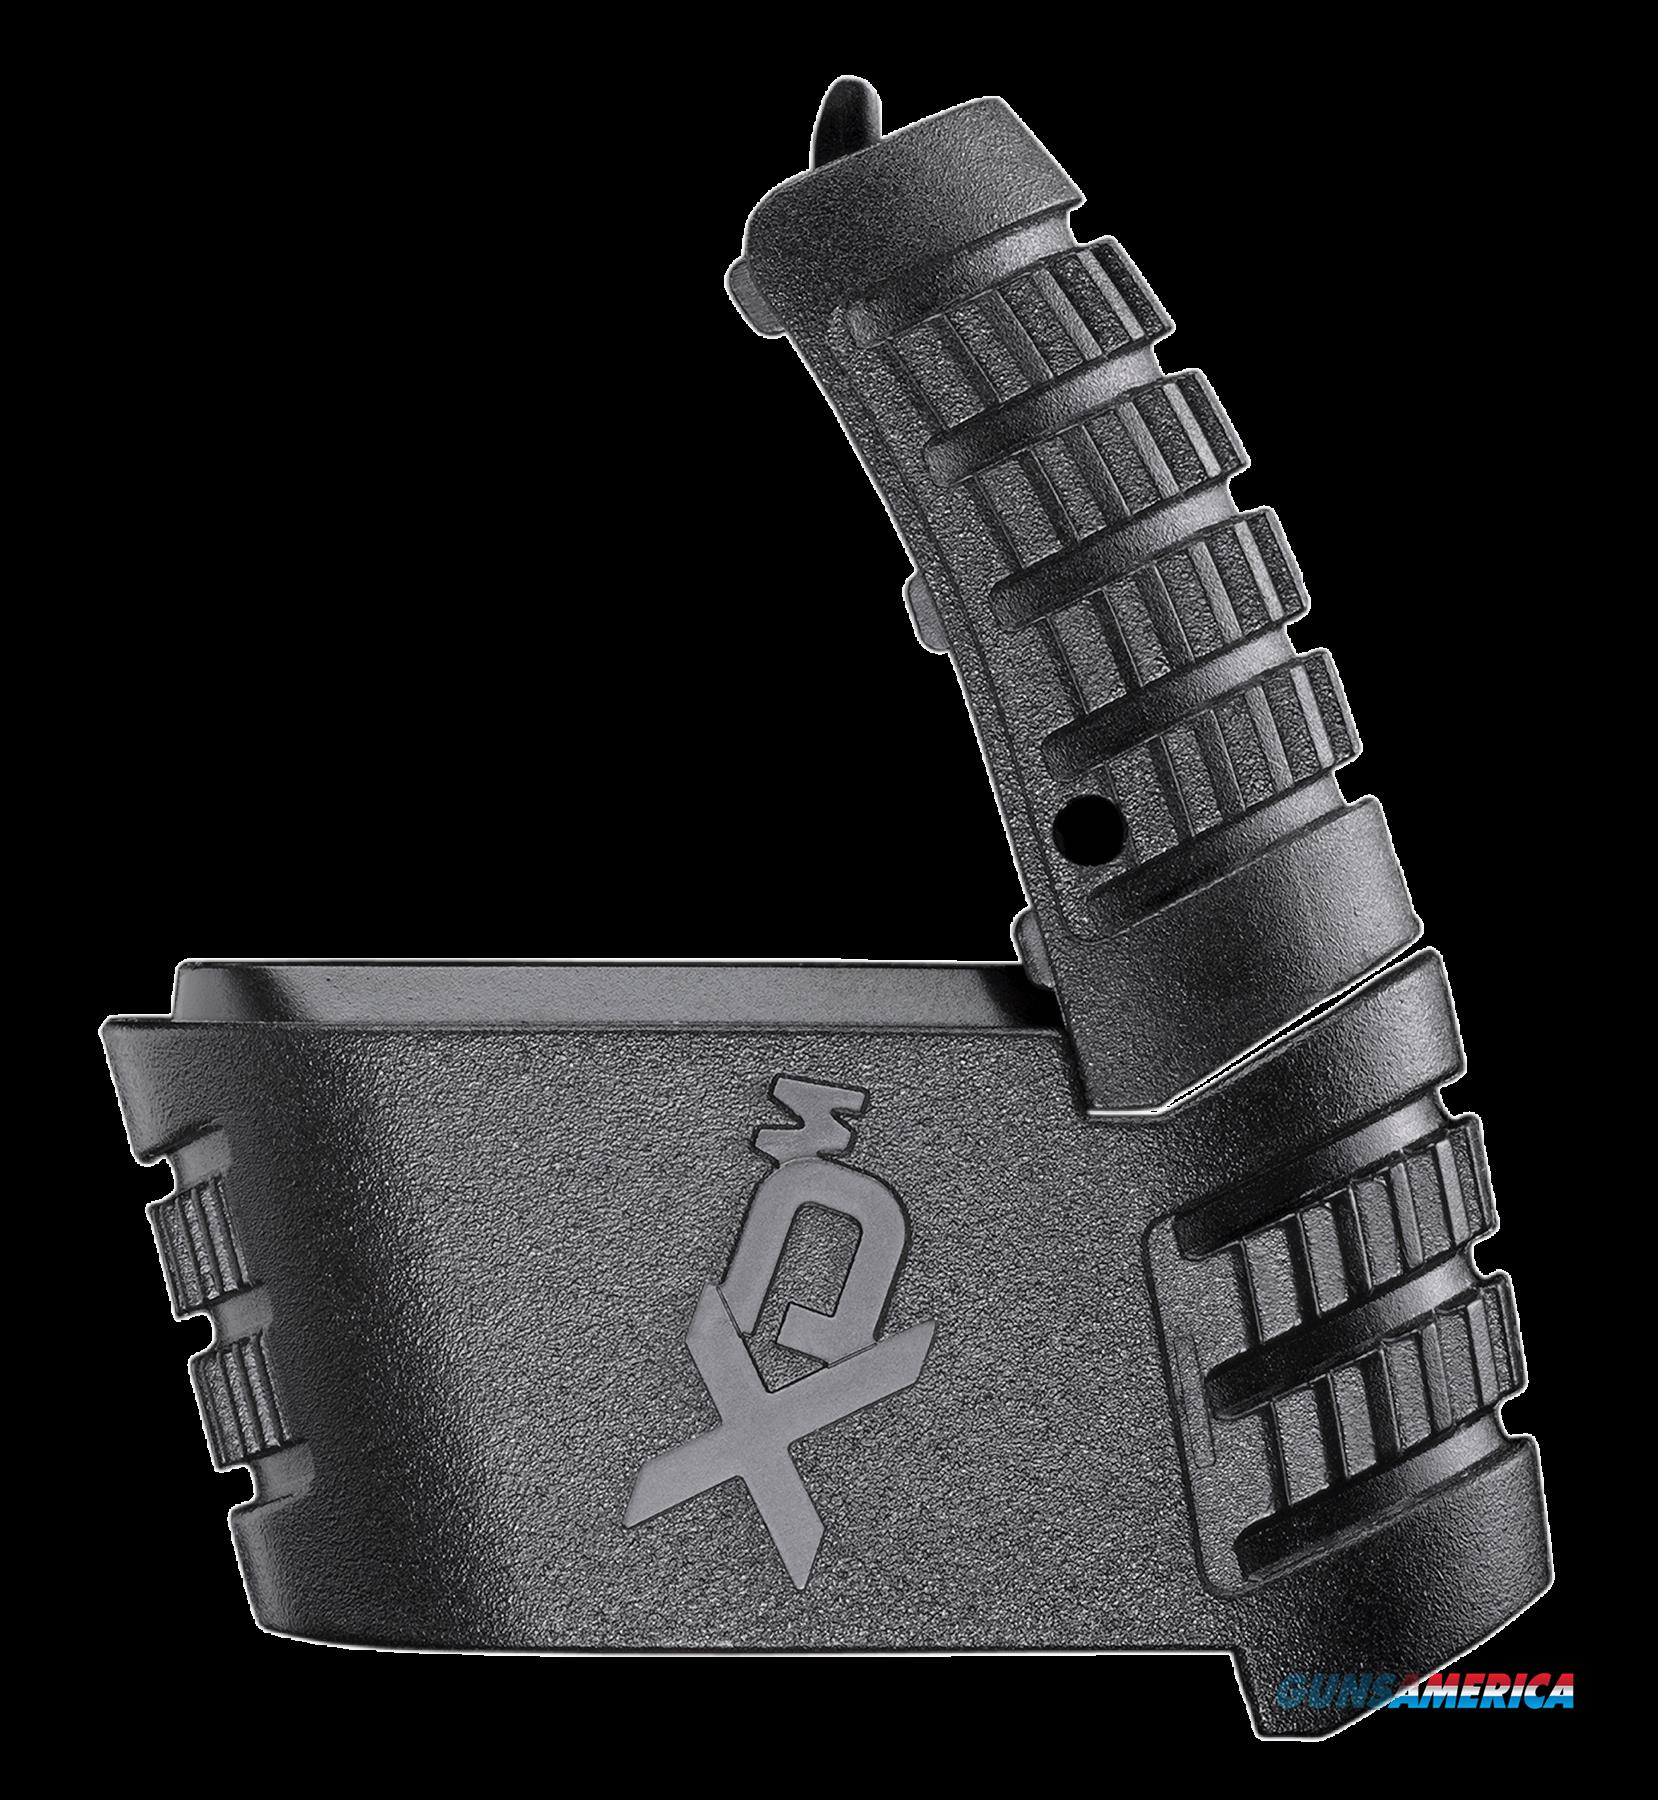 Springfield Armory Xd(m)-xd(m) Compact, Spg Xdm50193    Mag Comp Sleeve #3 9m 19r  Guns > Pistols > 1911 Pistol Copies (non-Colt)